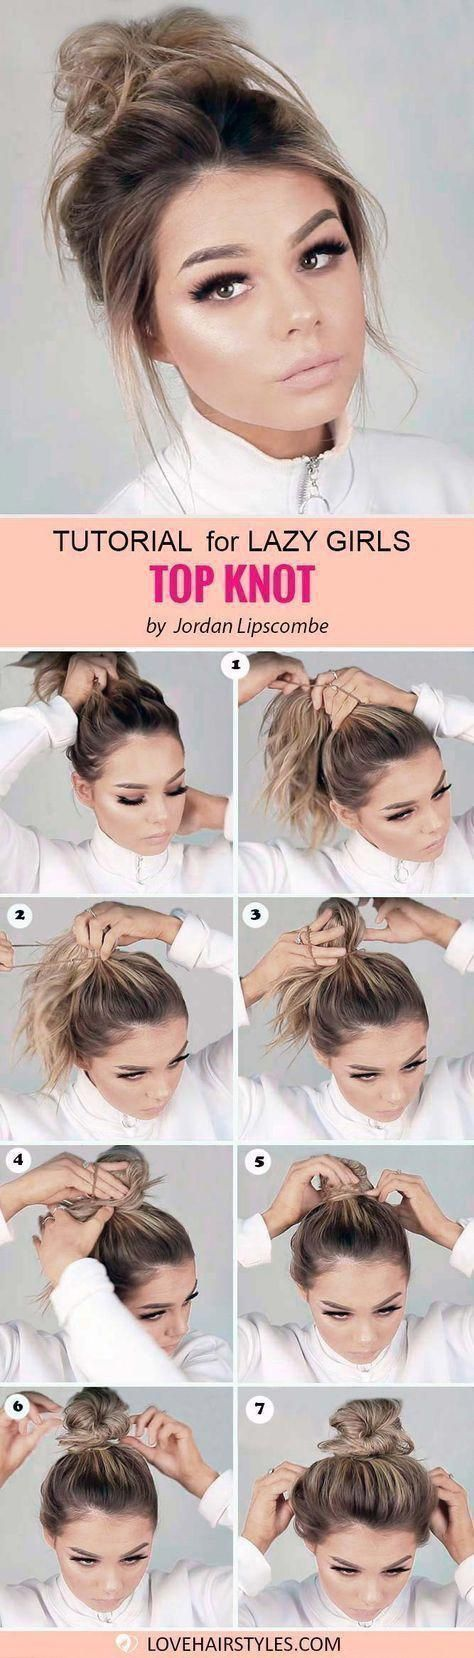 Wavy Fine Hair Best Hairstyle Women Shairstyles Women Shairstyles2018 Women Shairstylesforthinninghair Medium Hair Styles Easy Hairstyles Long Hair Styles